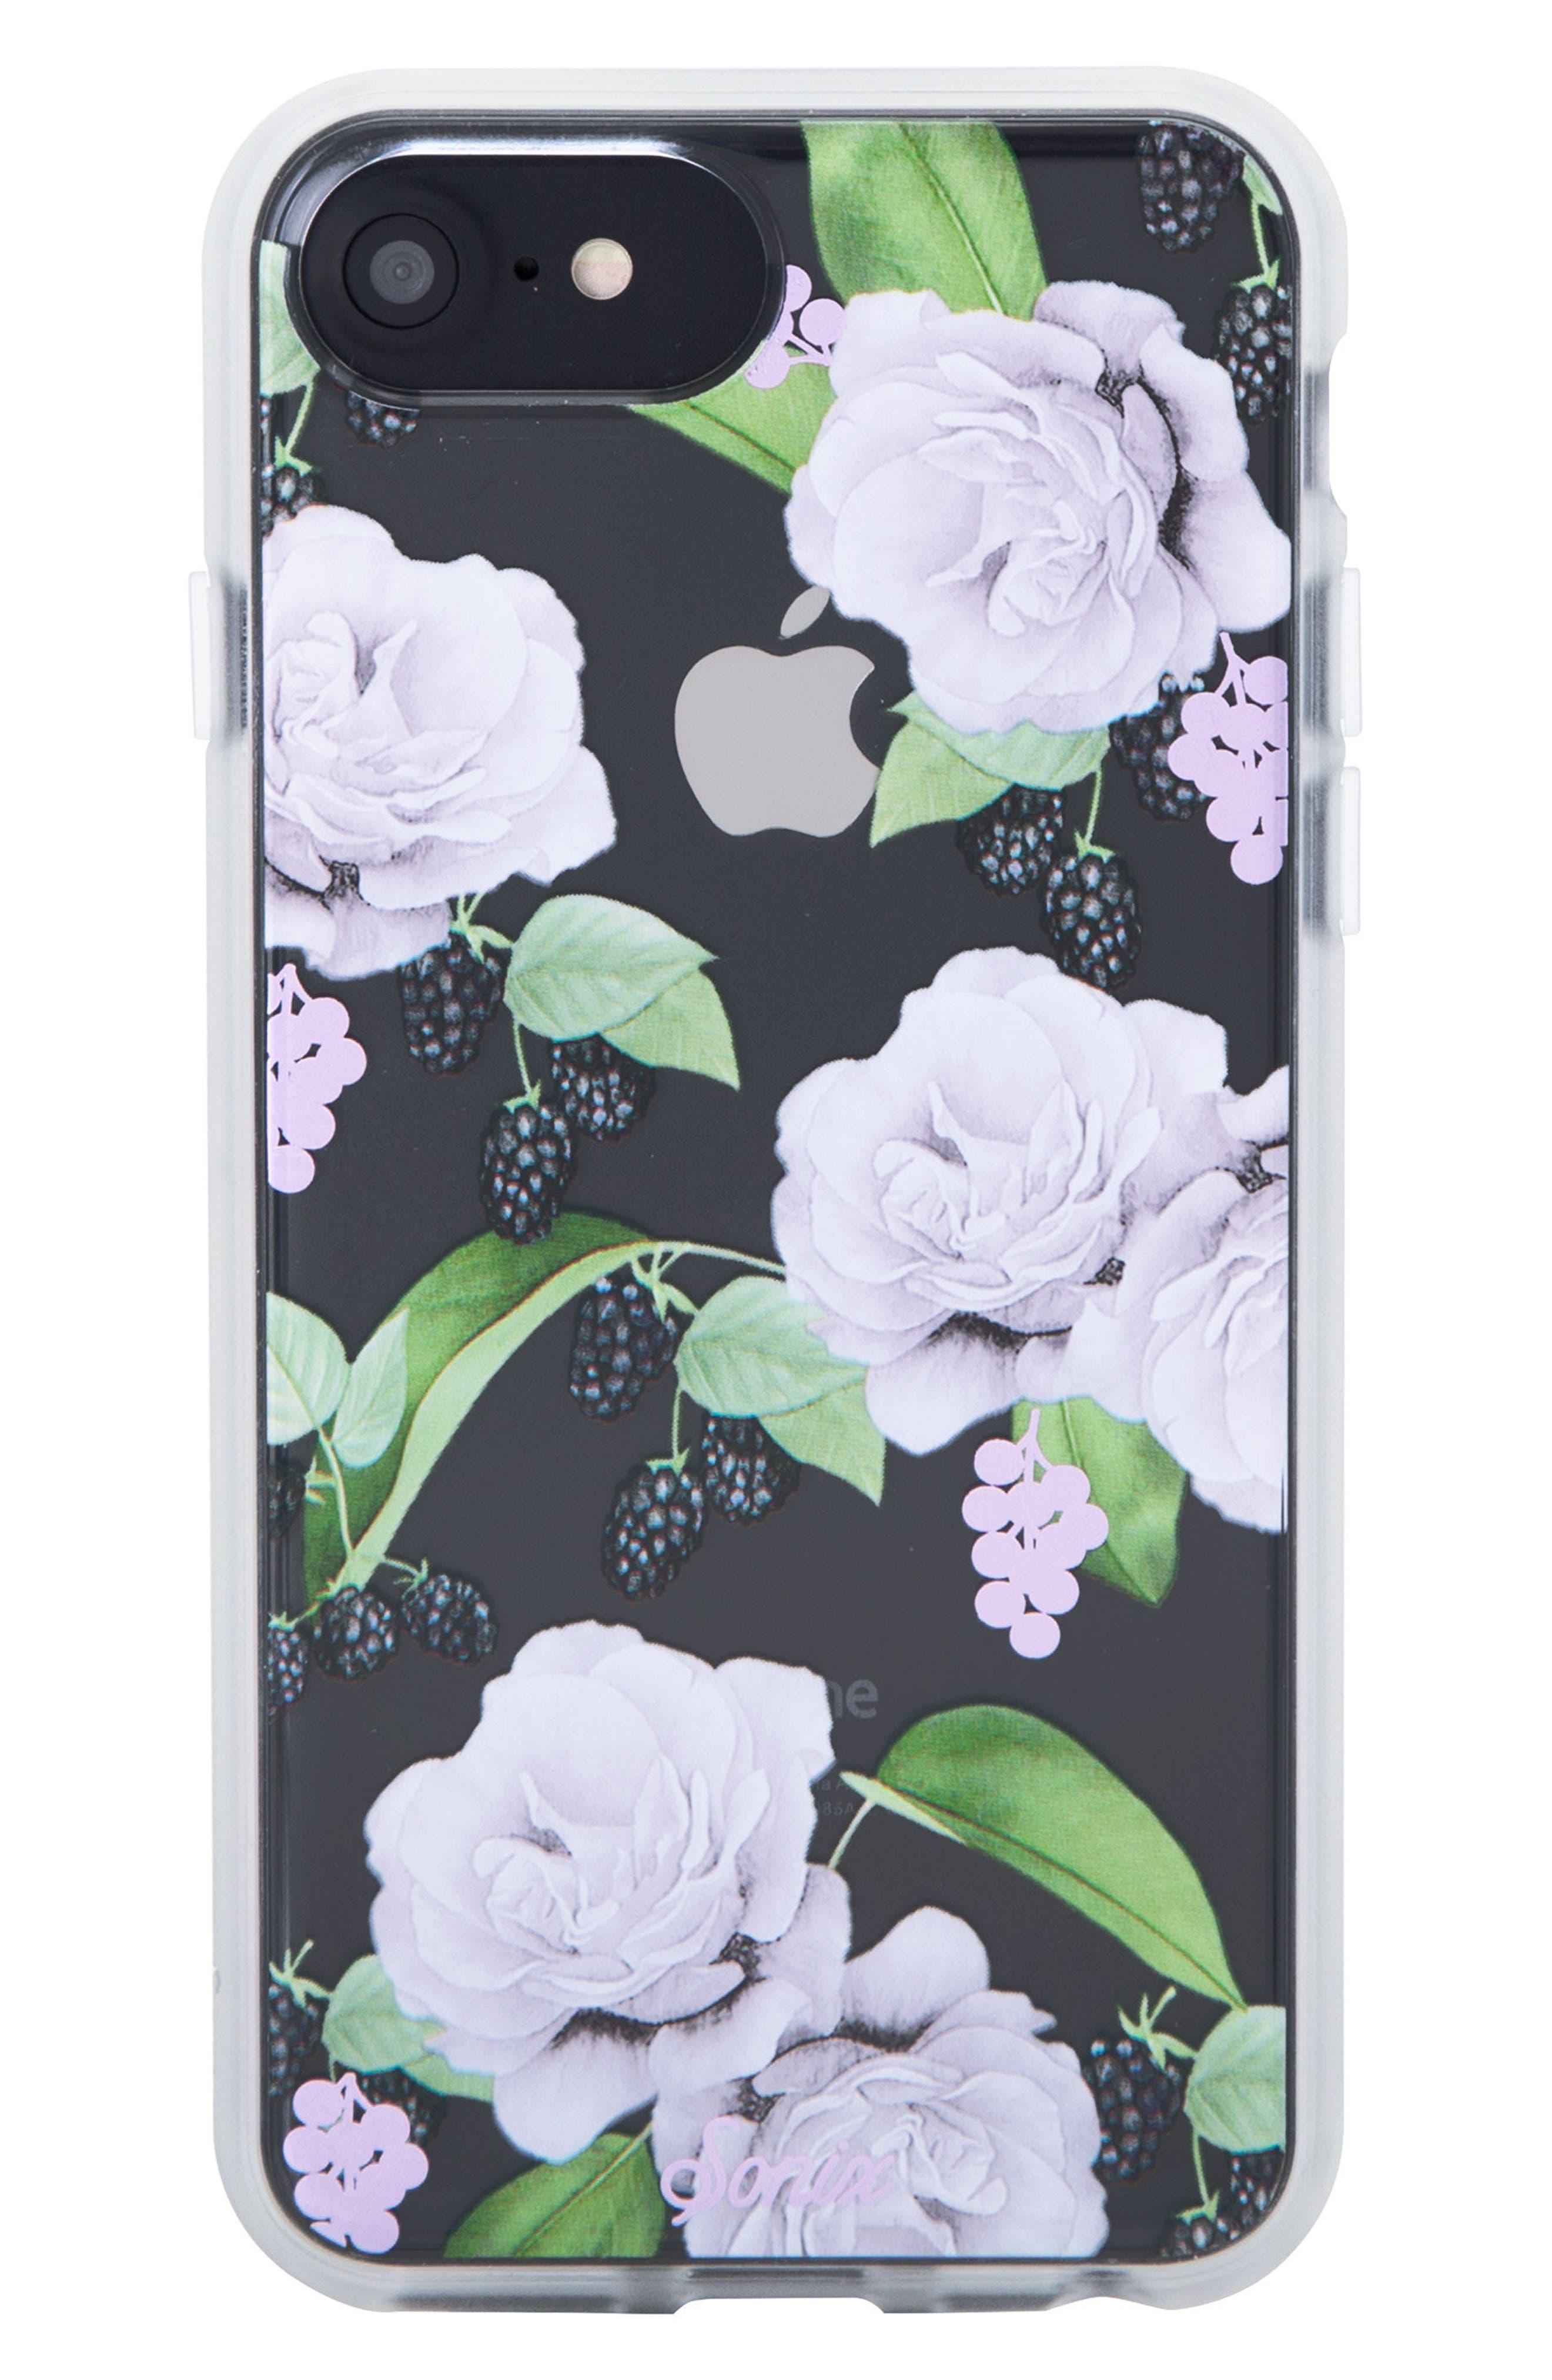 Floral Berry iPhone 6/6s/7/8 & 6/6s/7/8 Plus Case, Main, color, WHITE/ LILAC